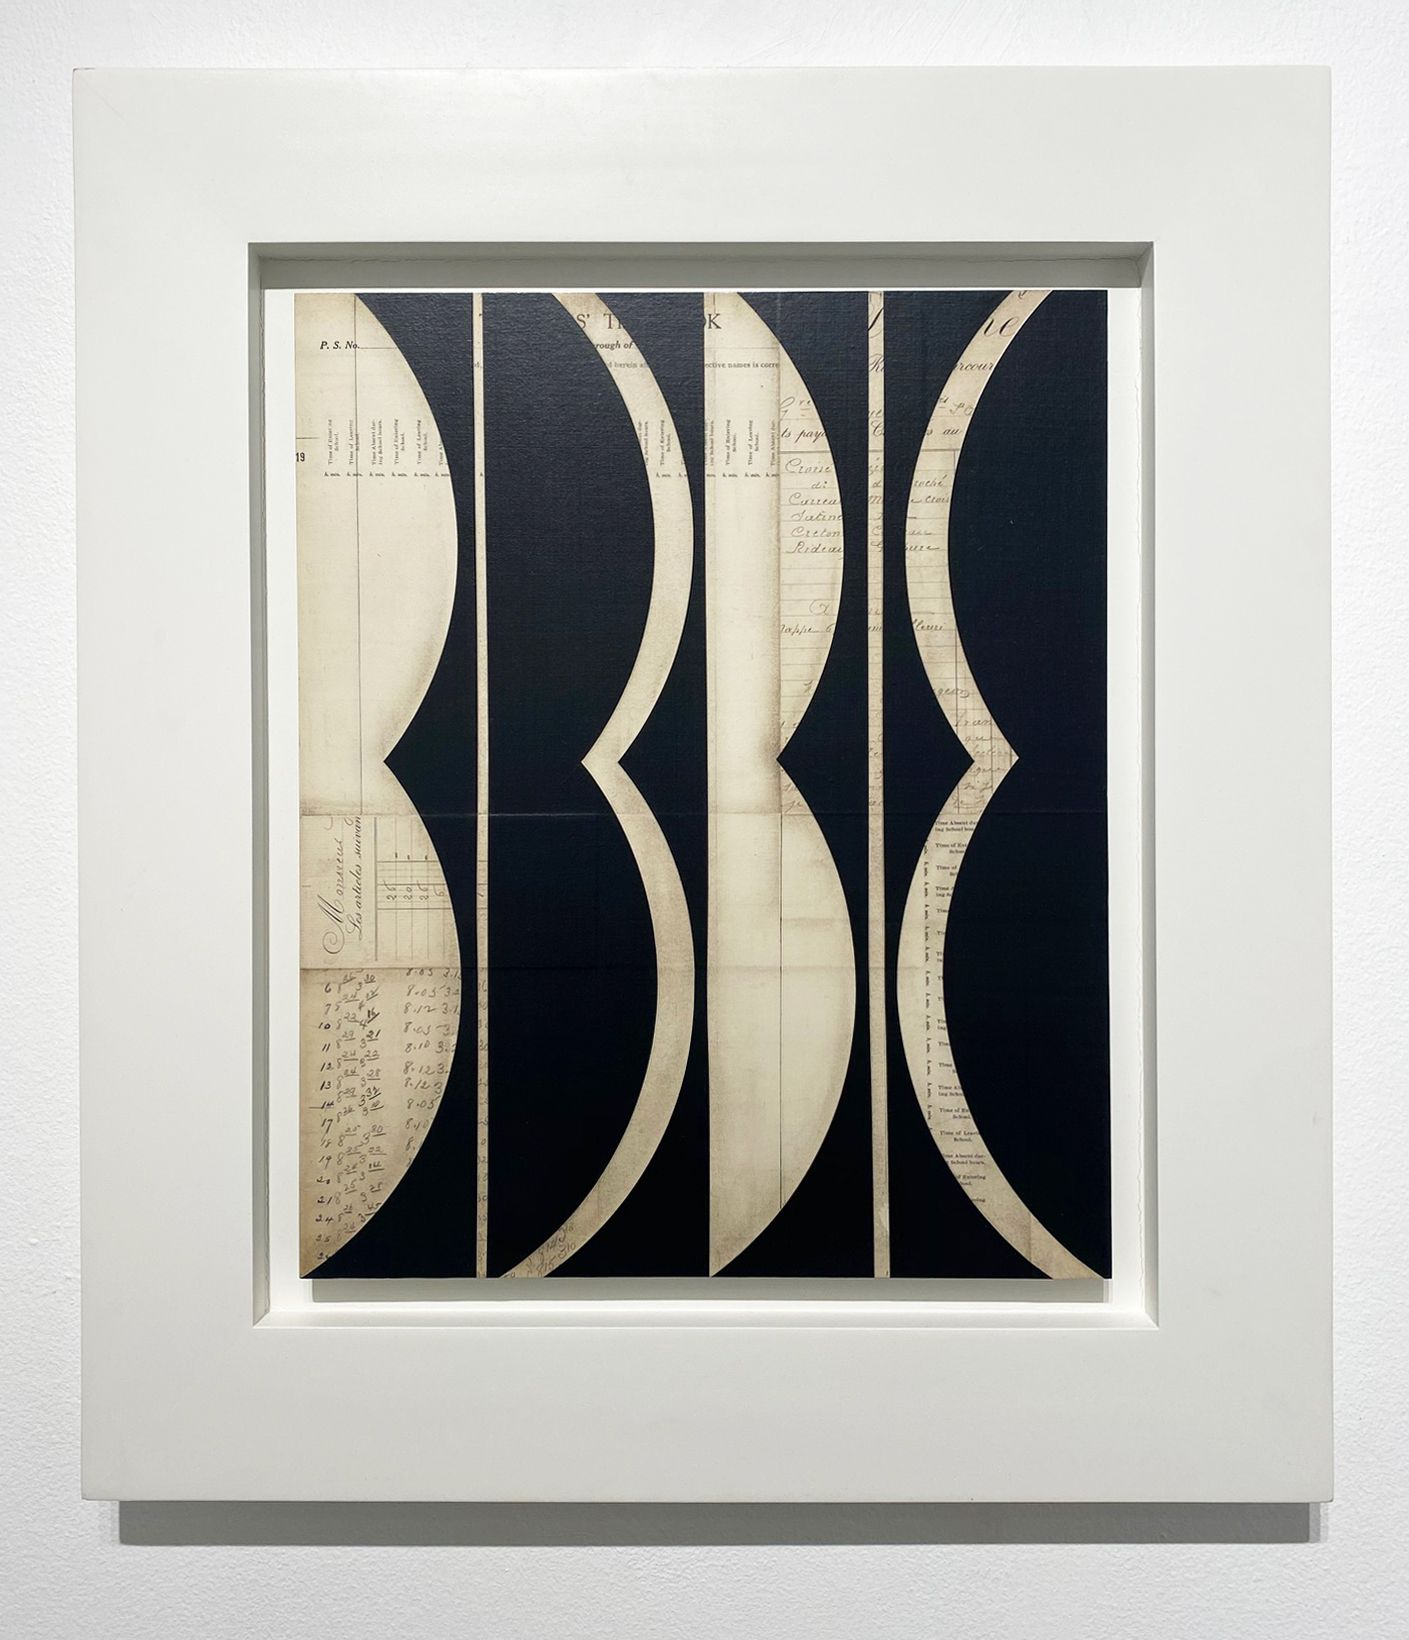 Robert Kelly, Bibi Nocturne I, 2012